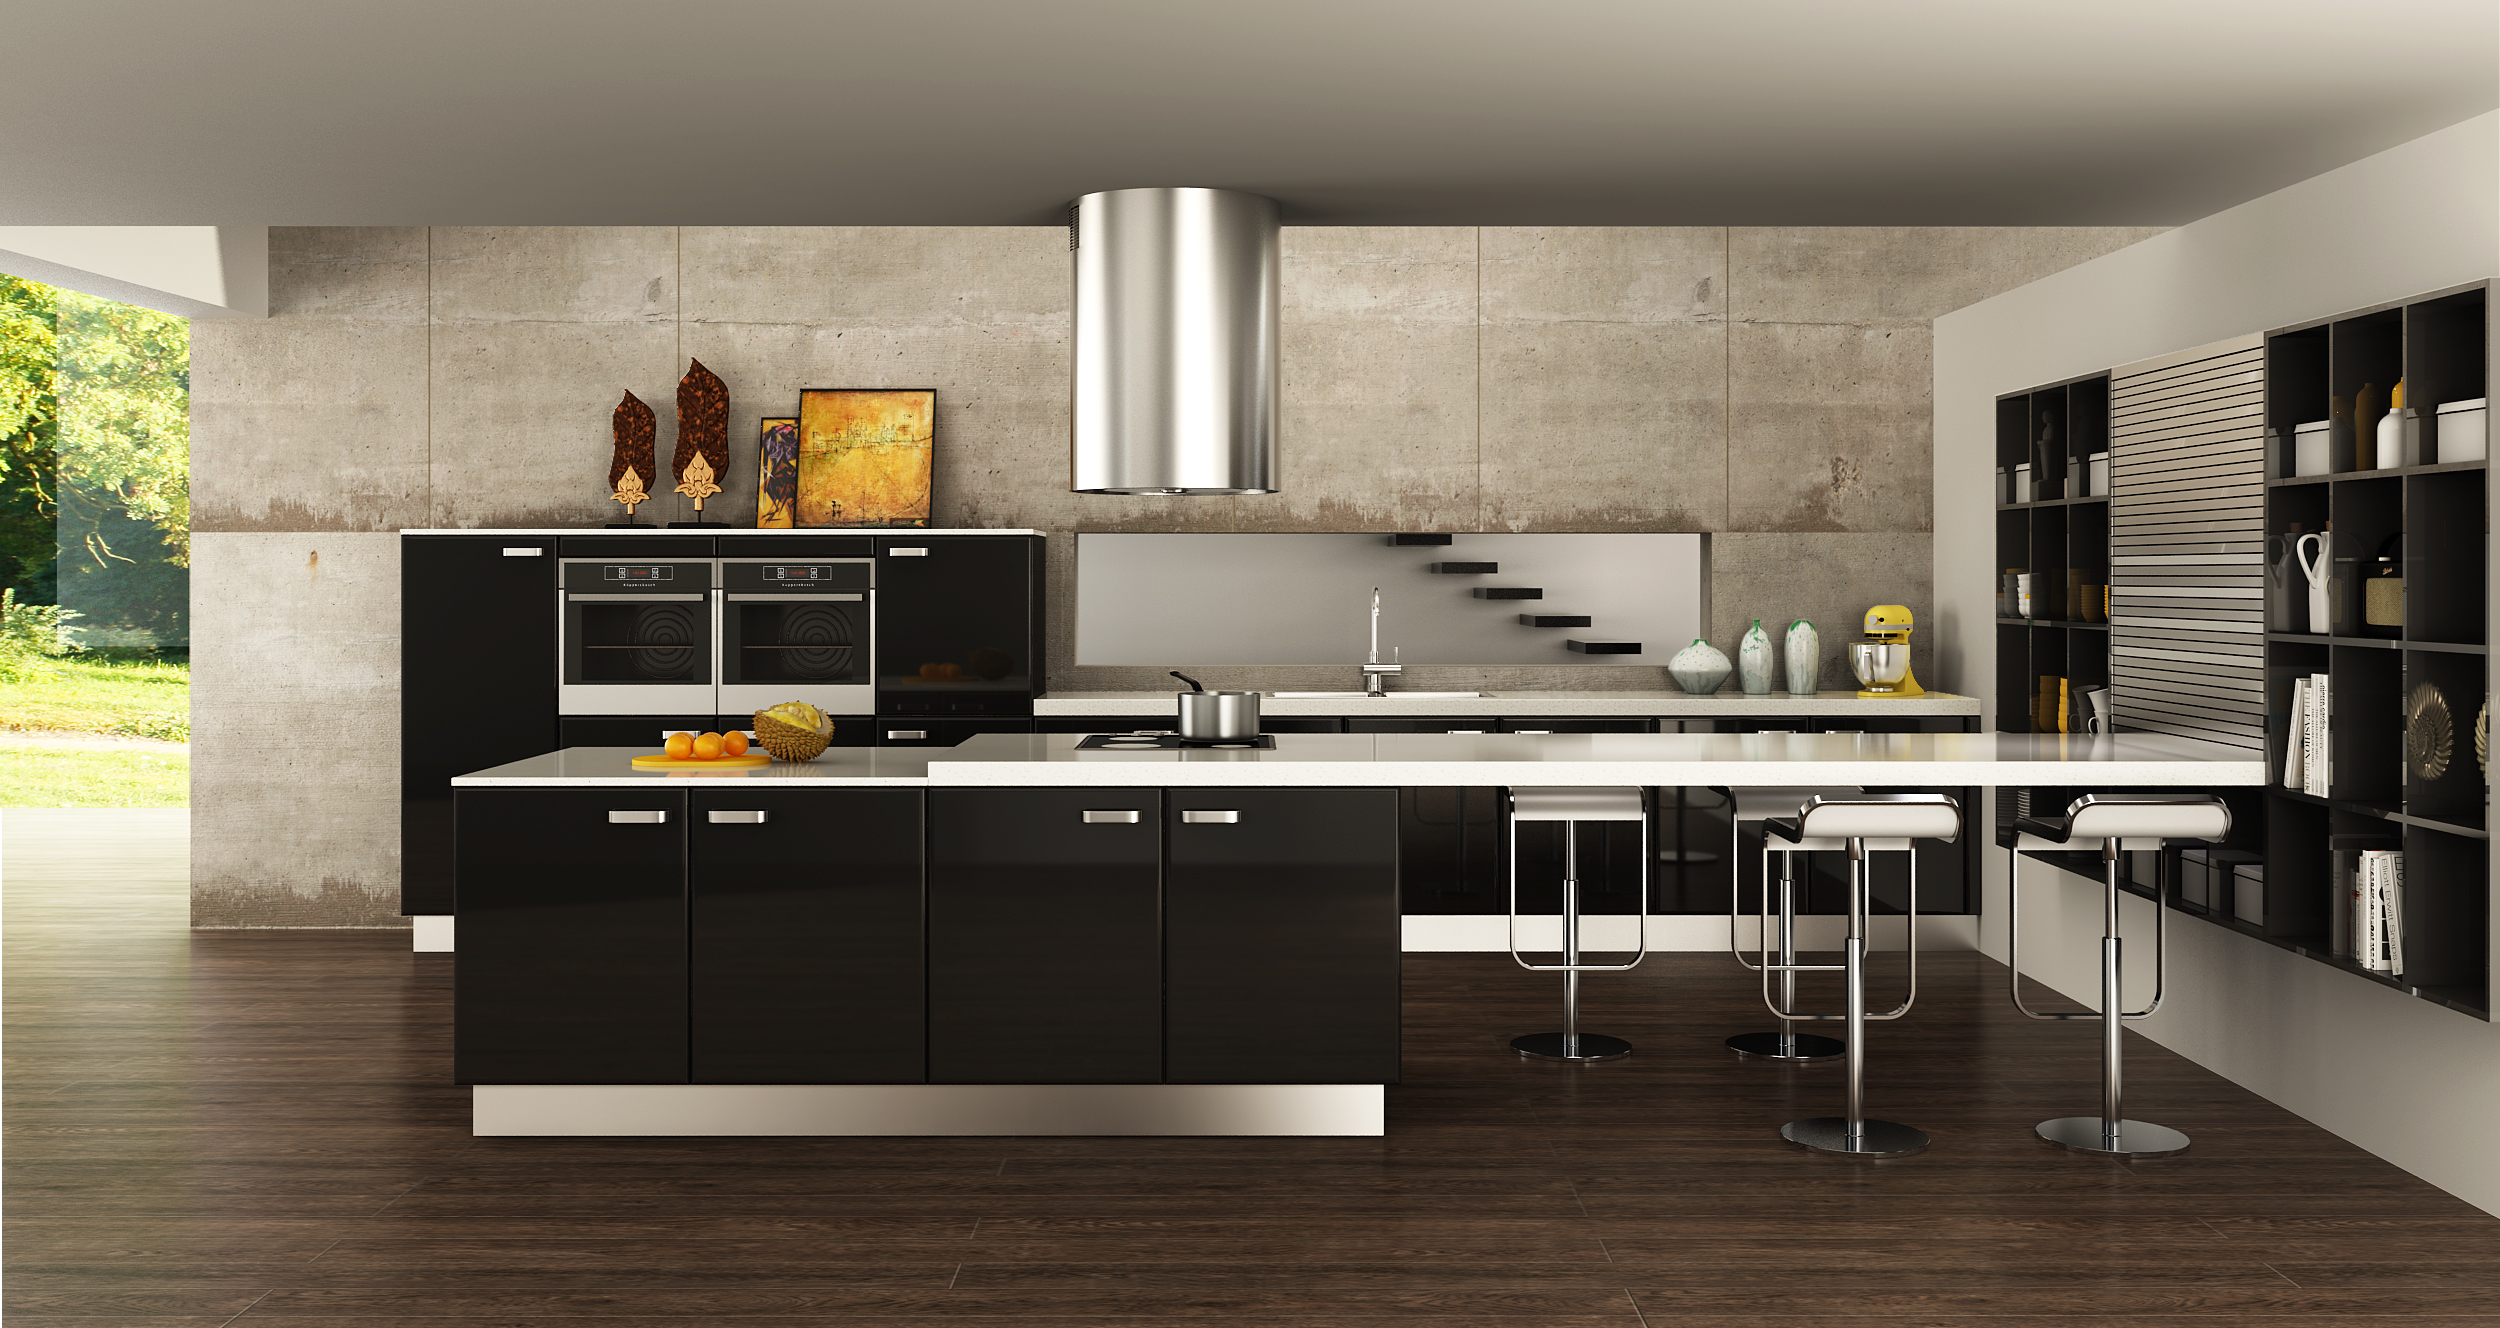 Oppein Kitchen In Africa 187 Op15 L15 Contemporary Black